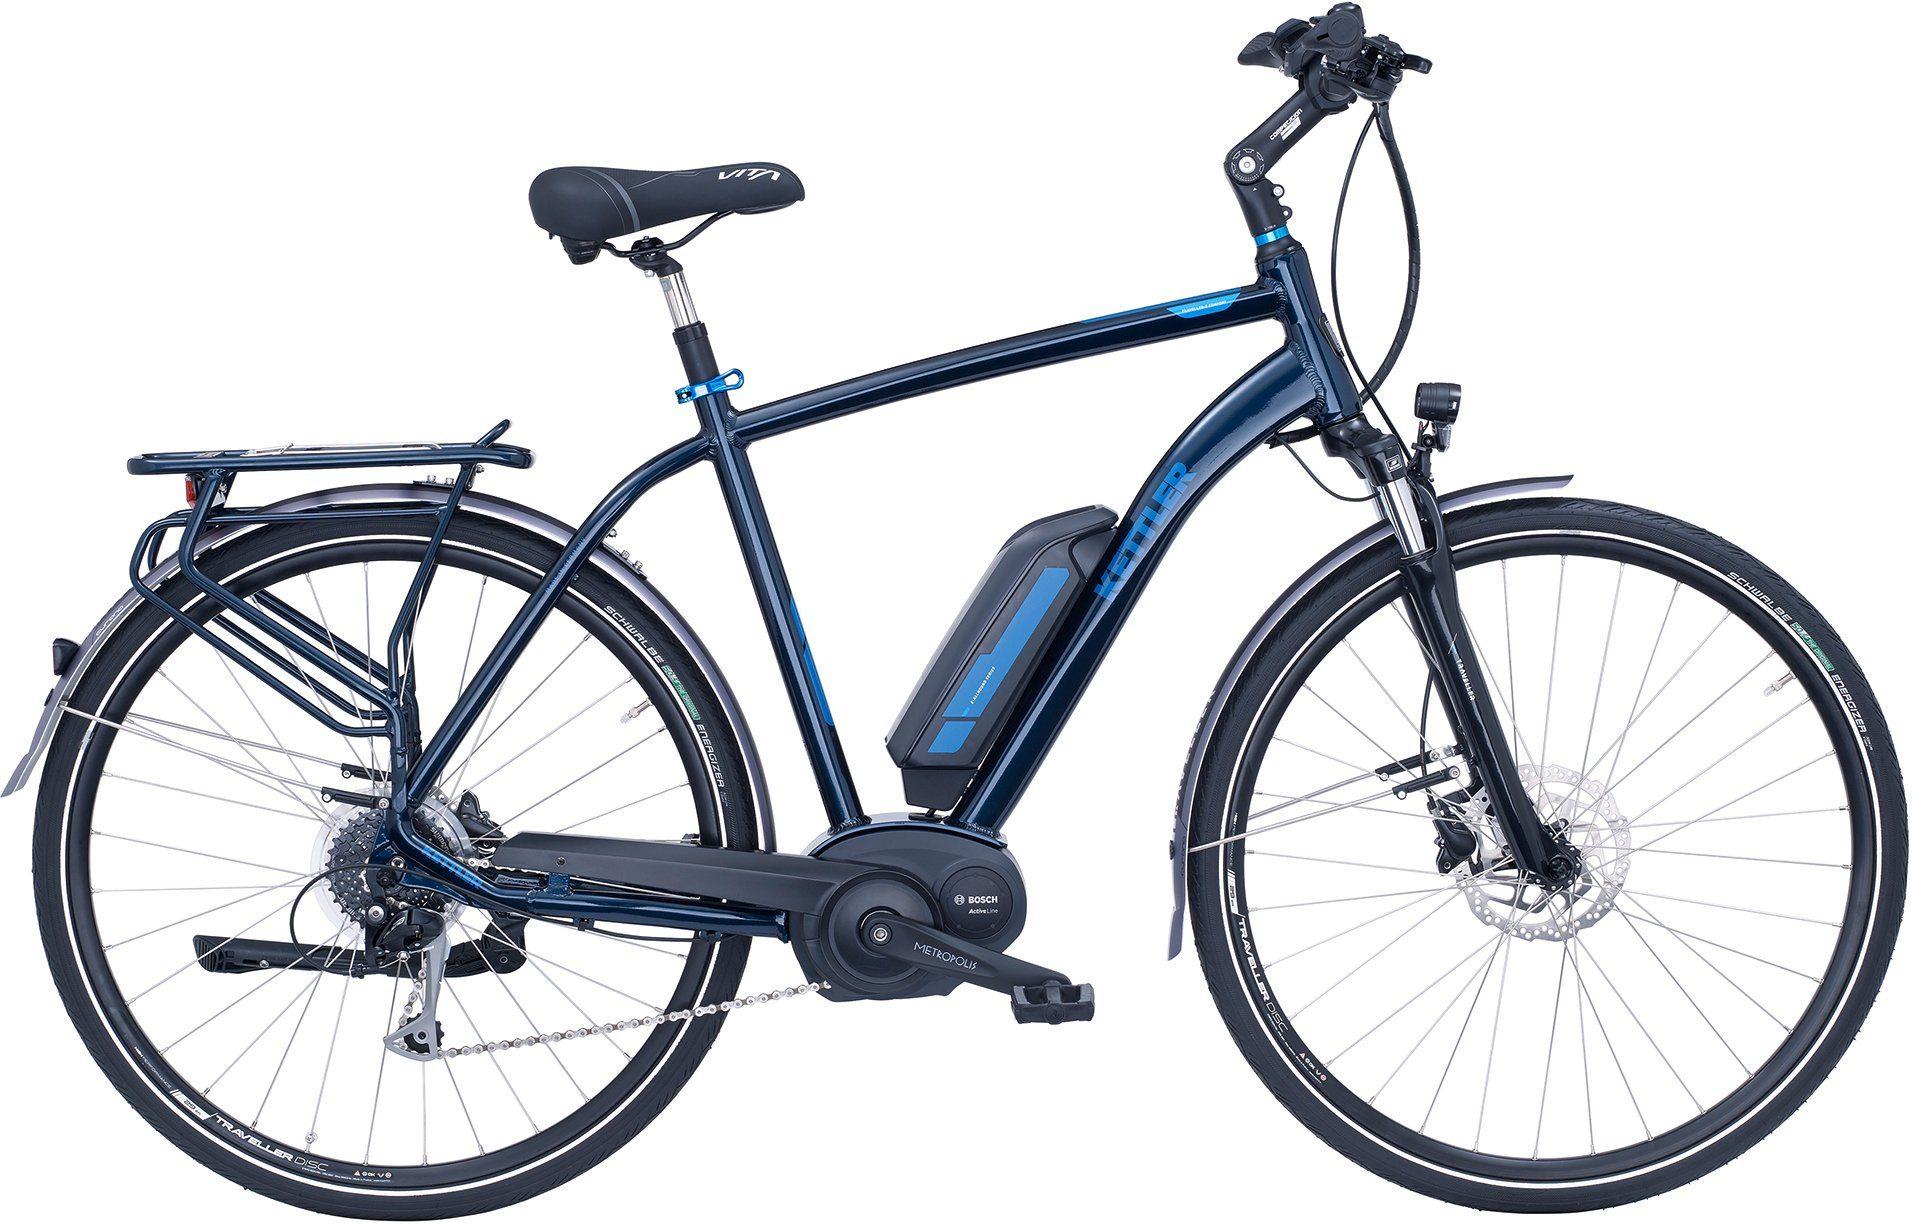 Kettler E-Bike »Traveller E Comfort«, 8 Gang Shimano Alivio Schaltwerk, Kettenschaltung, Mittelmotor 250 W